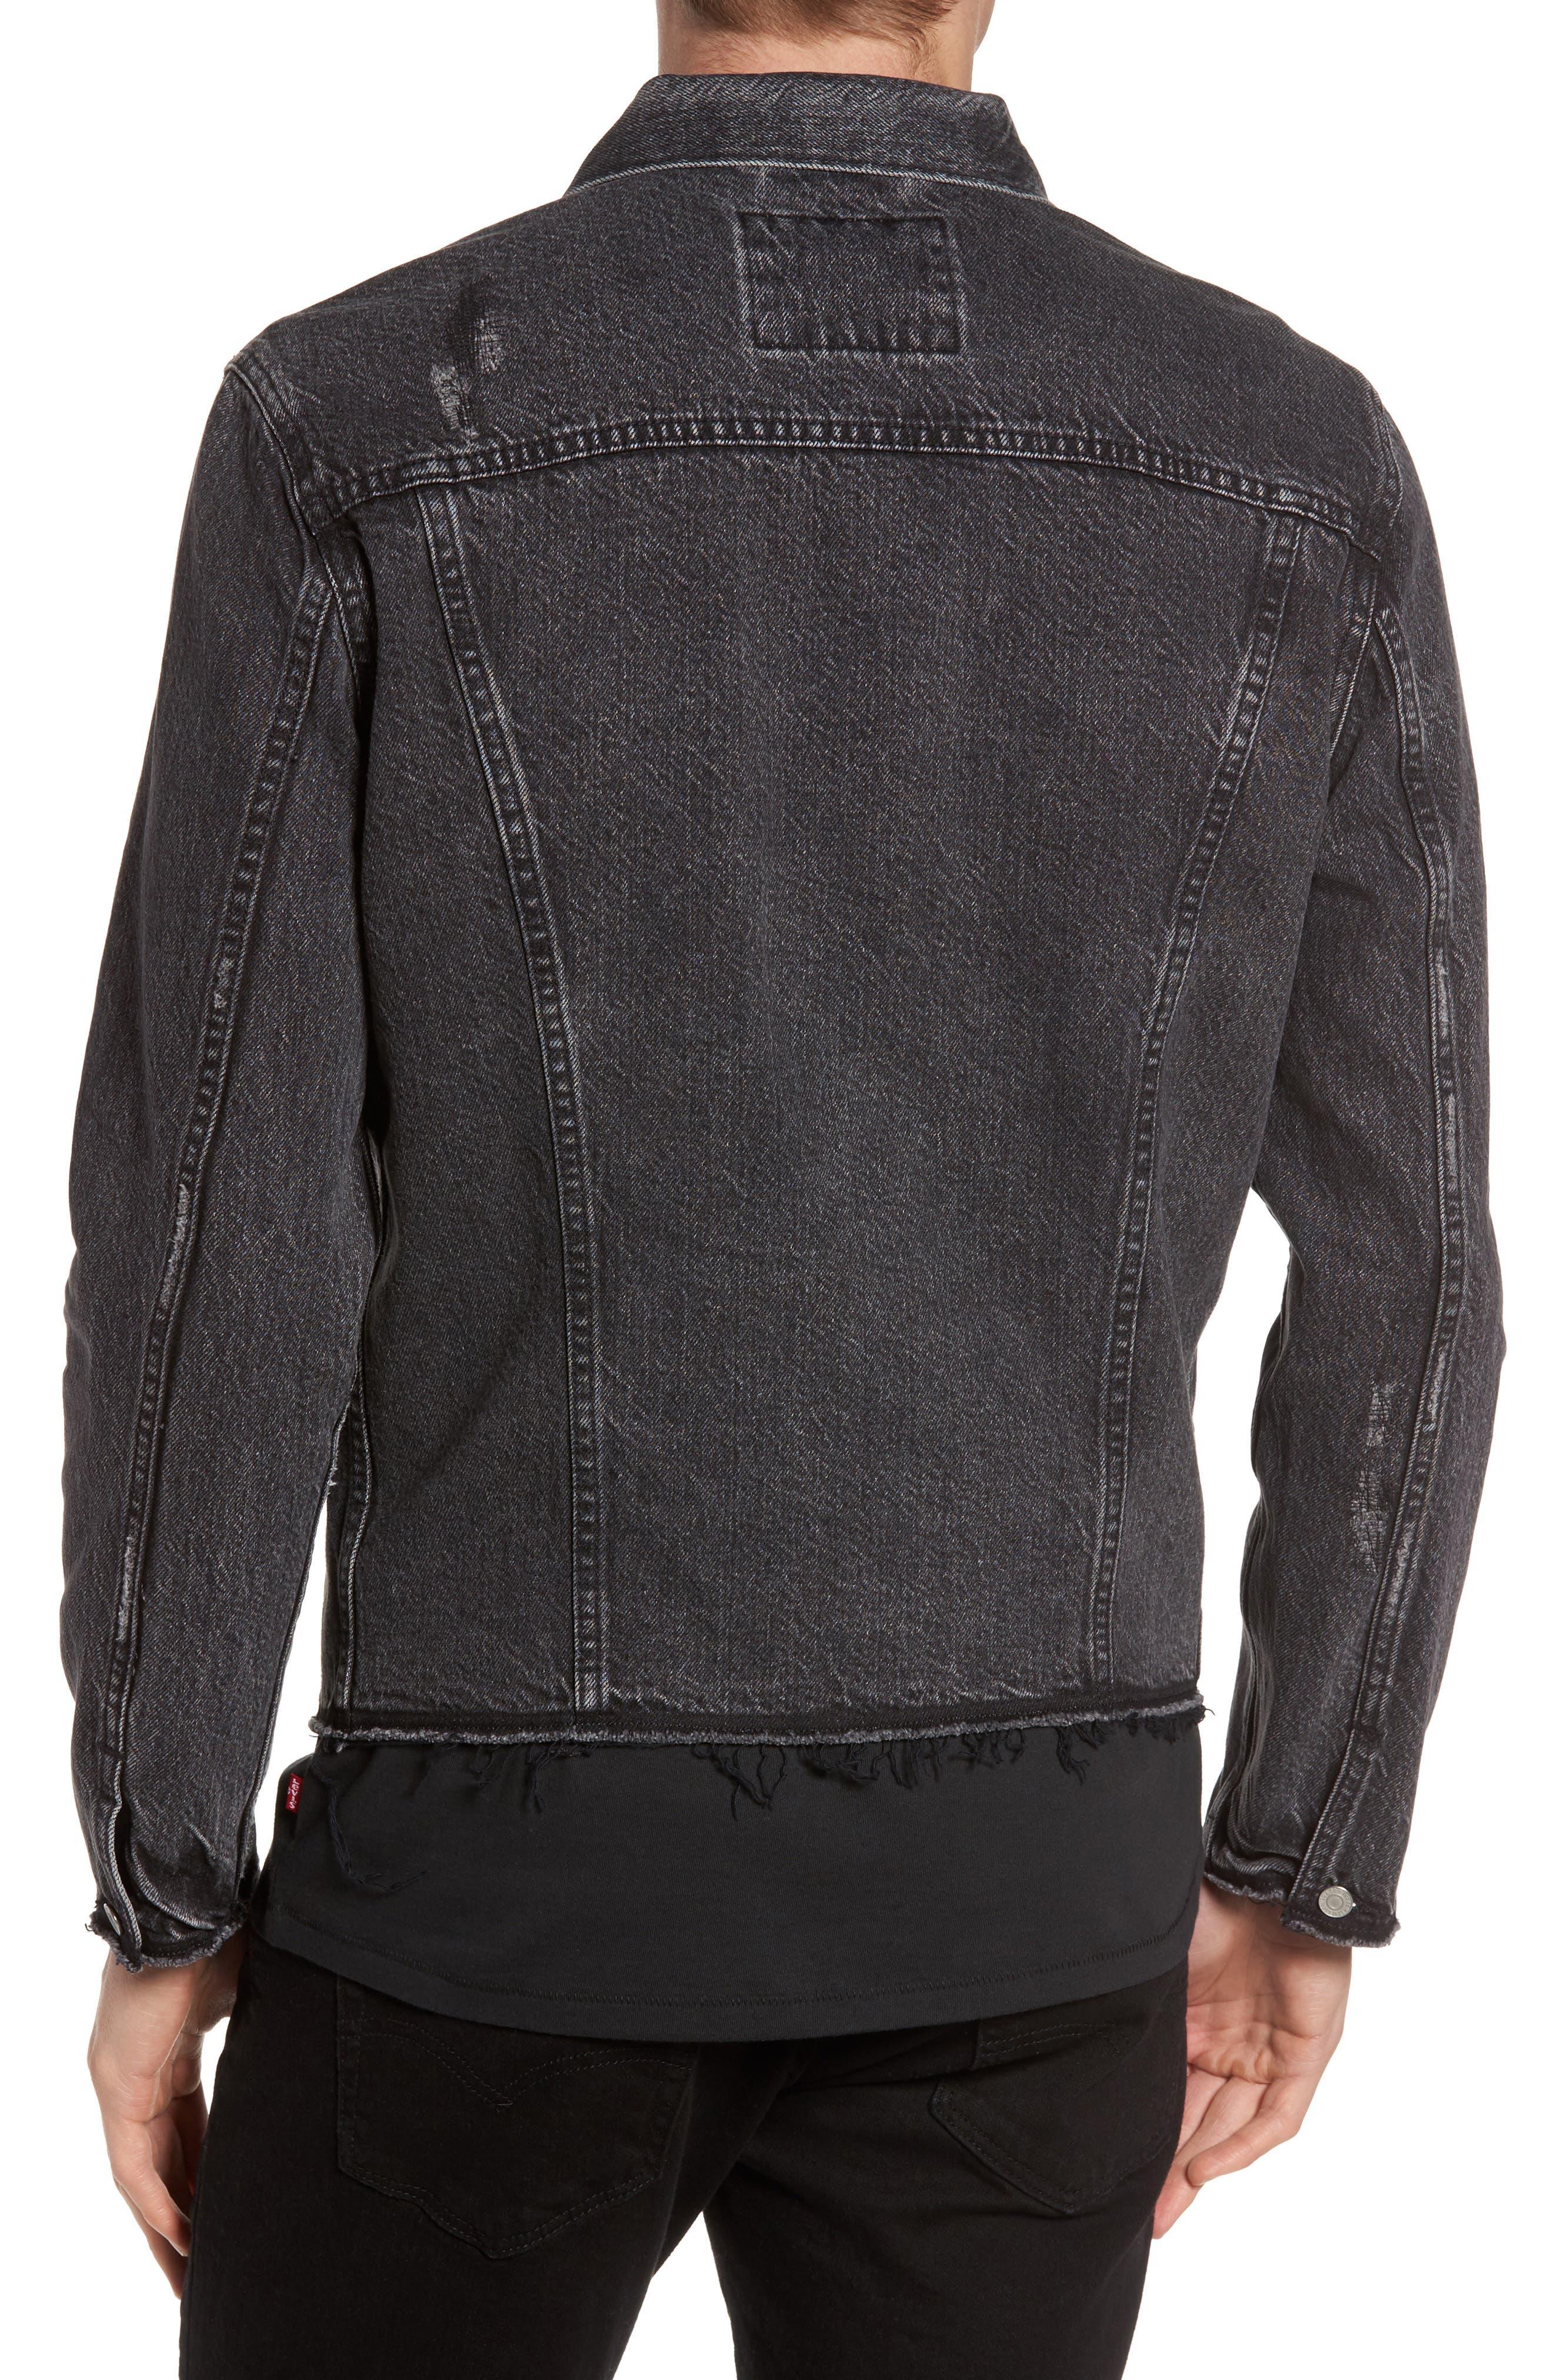 Alternate Image 2  - Levi's® Altered Distressed Denim Trucker Jacket